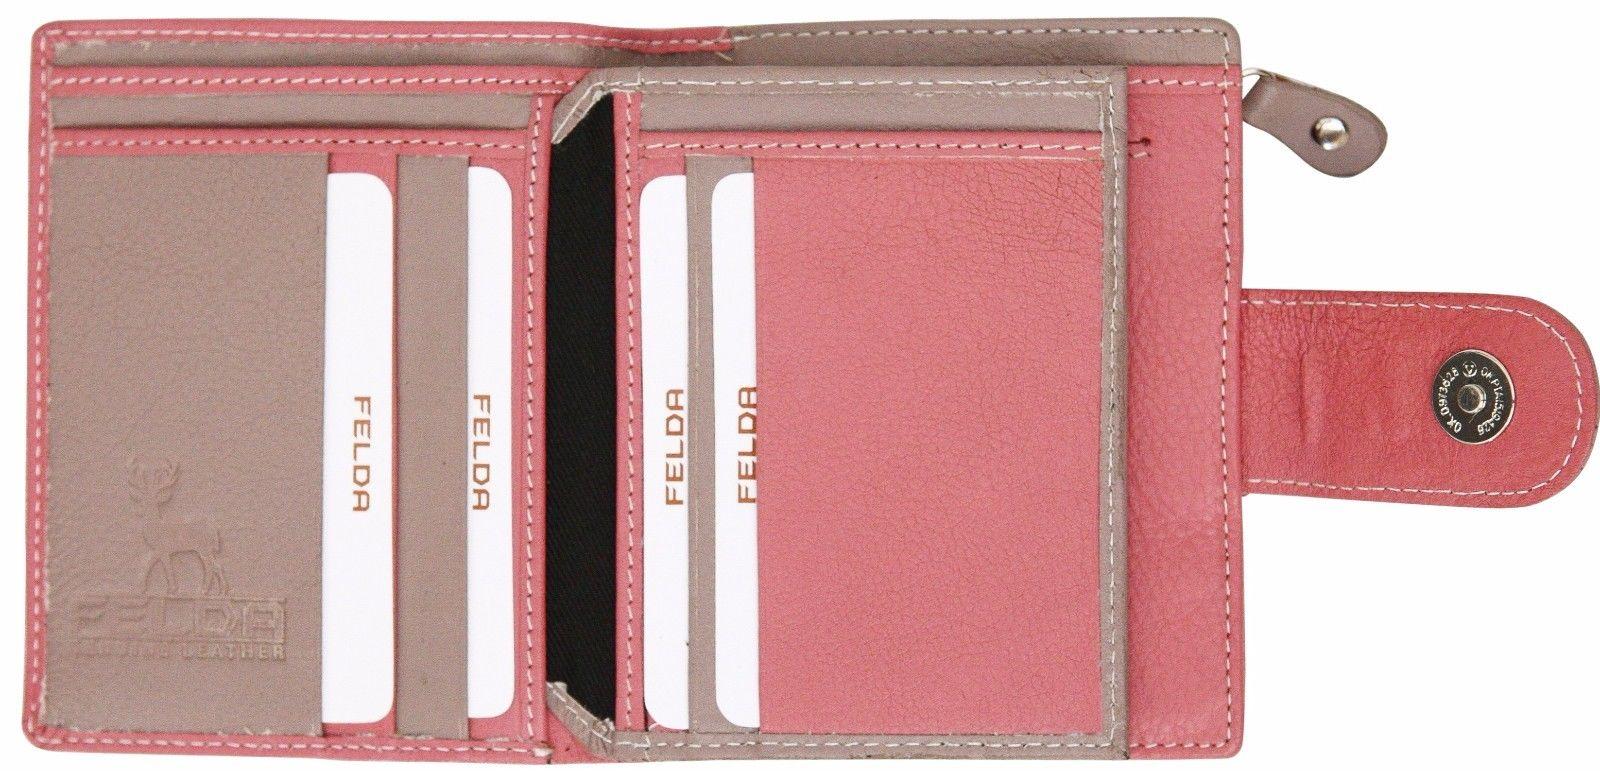 Felda-RFID-onorevoli-MEDAGLIA-amp-Card-Purse-Wallet-Genuine-Leather-Multi-SOFT-BOX-REGALO miniatura 89